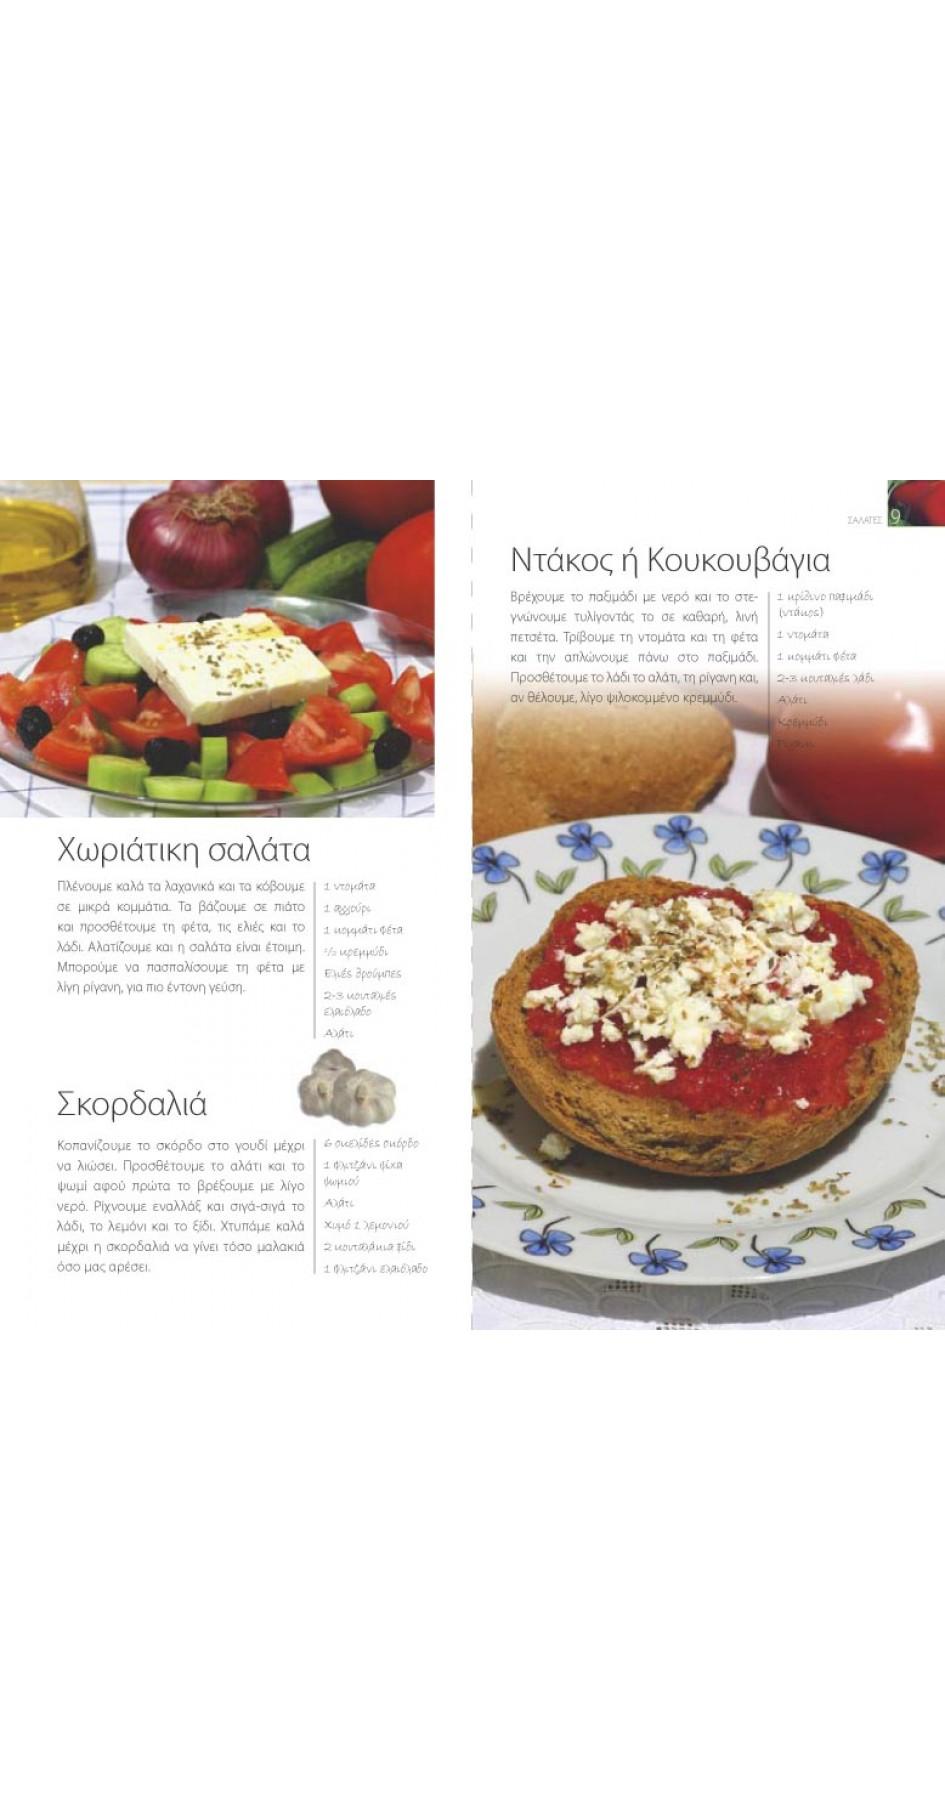 Cretan Cookery - Mum's 200 recipes (Greek)